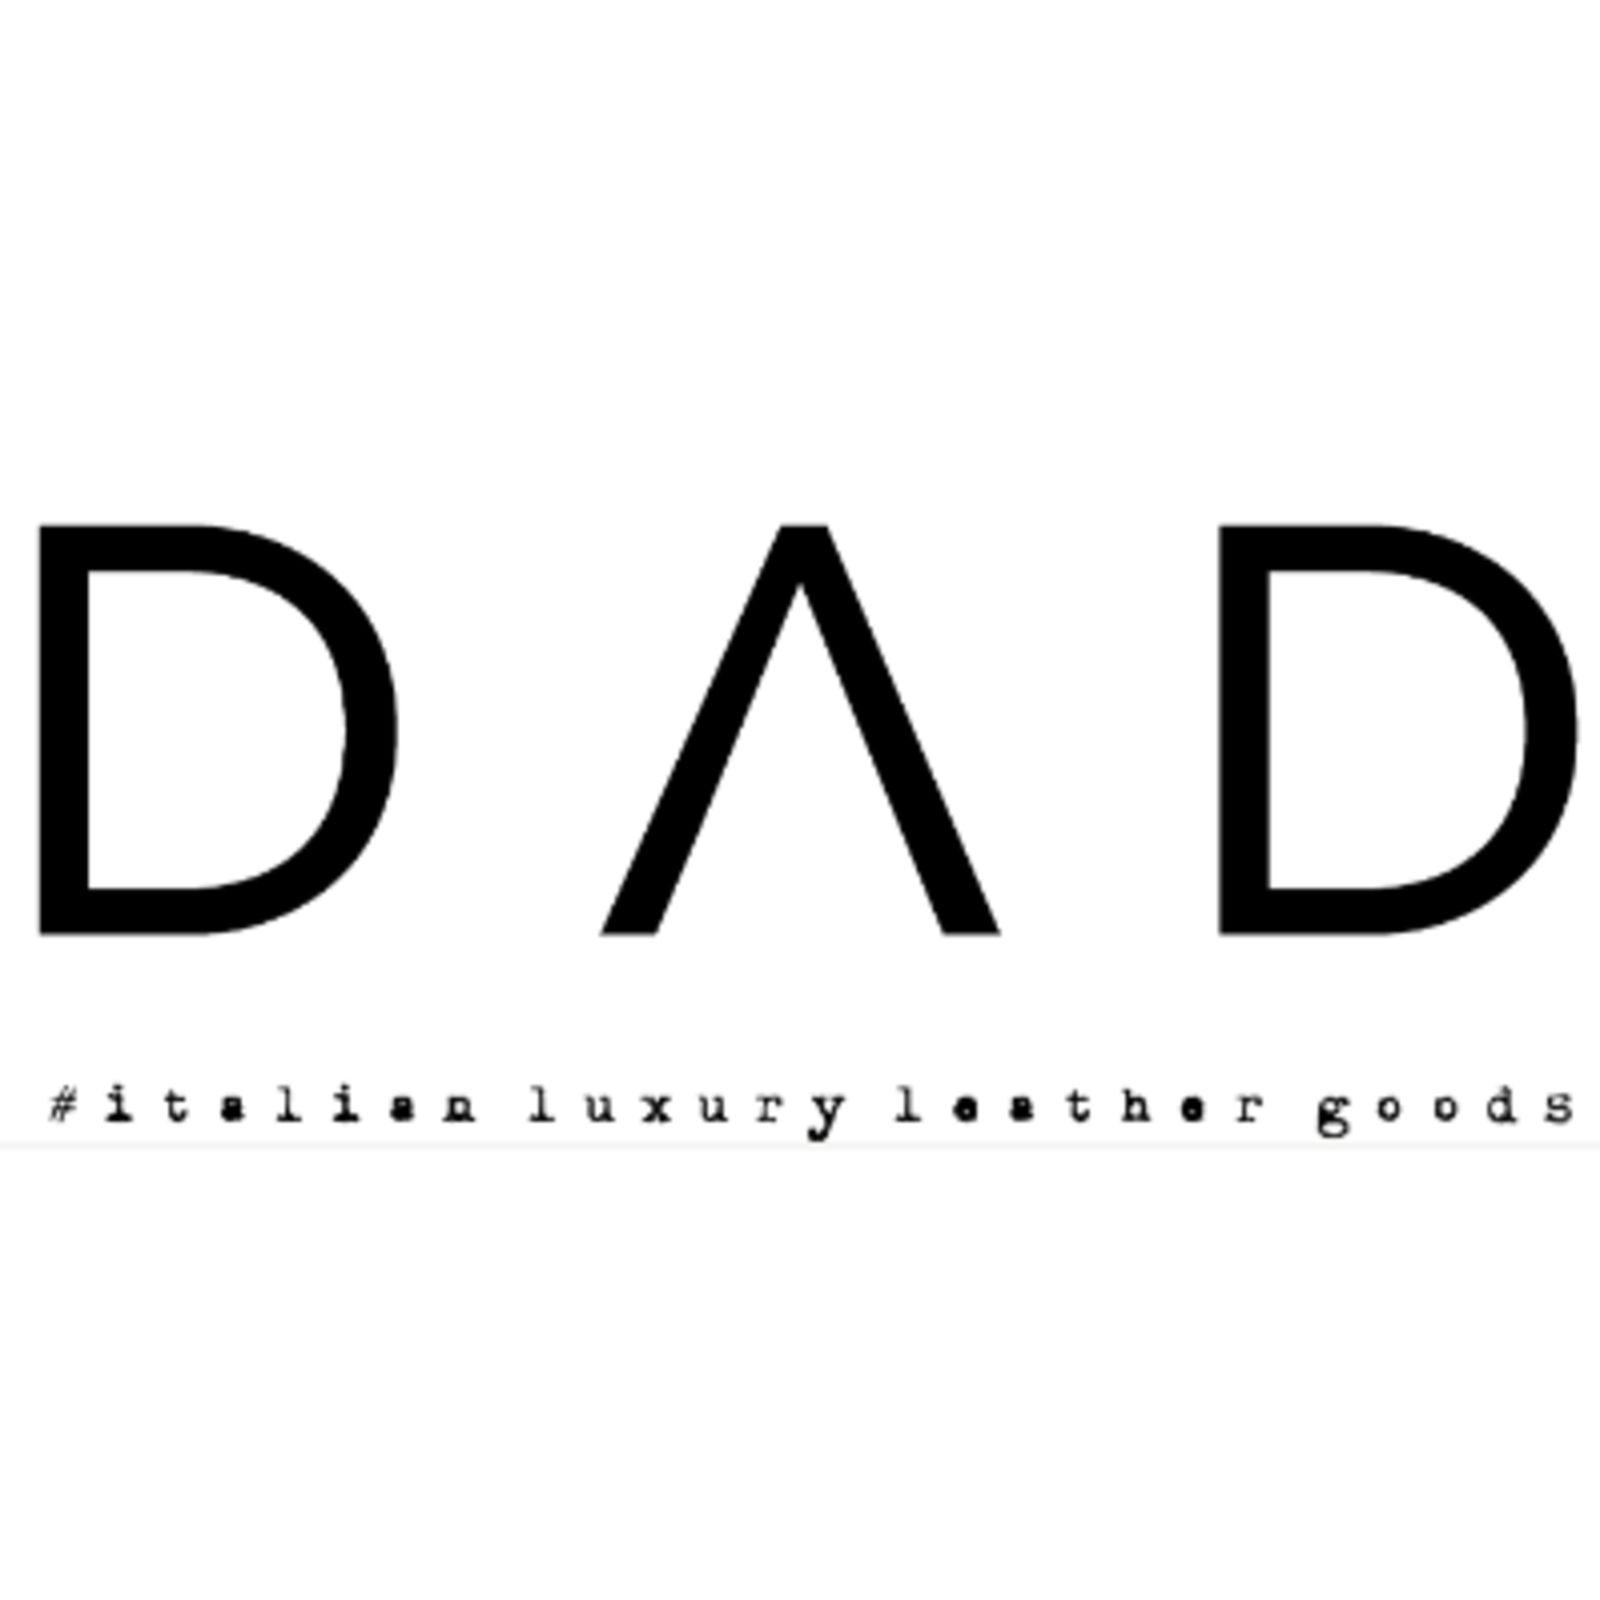 DAD | Davide Decarli